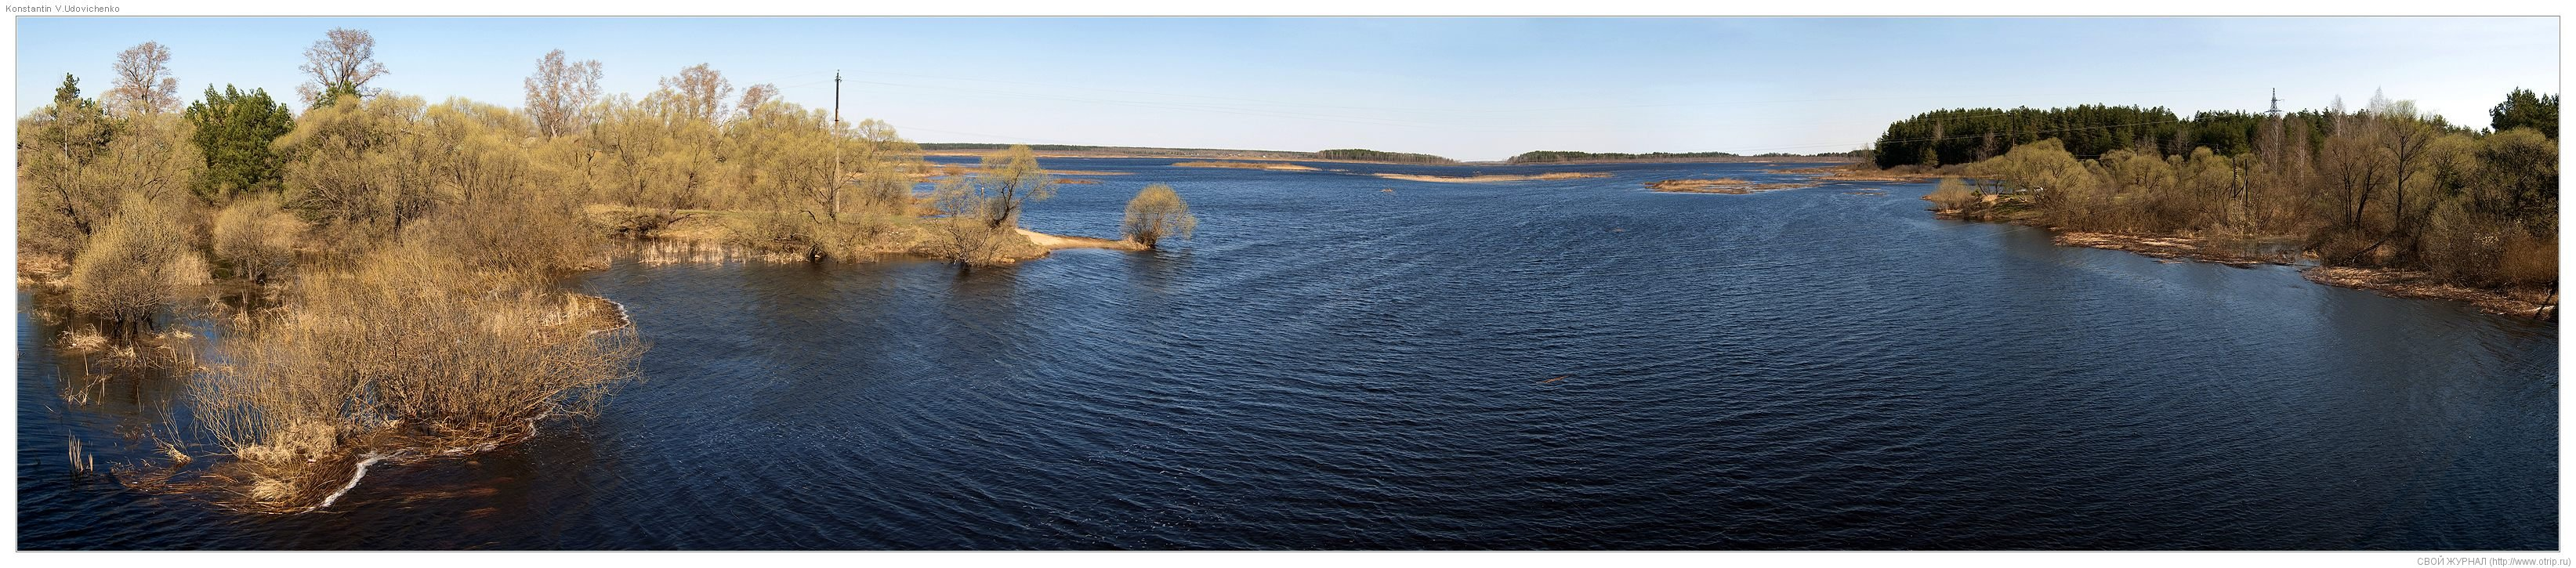 8951-8964s_2.jpg - Муром-Владимир-Суздаль (01-03.05.2009)